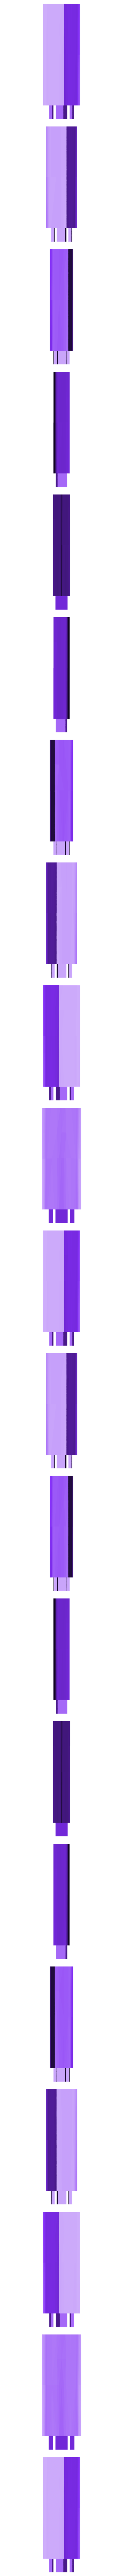 Masters_6.STL Download STL file sword he-man, skeletor • 3D printer design, RubenMenendezIglesias